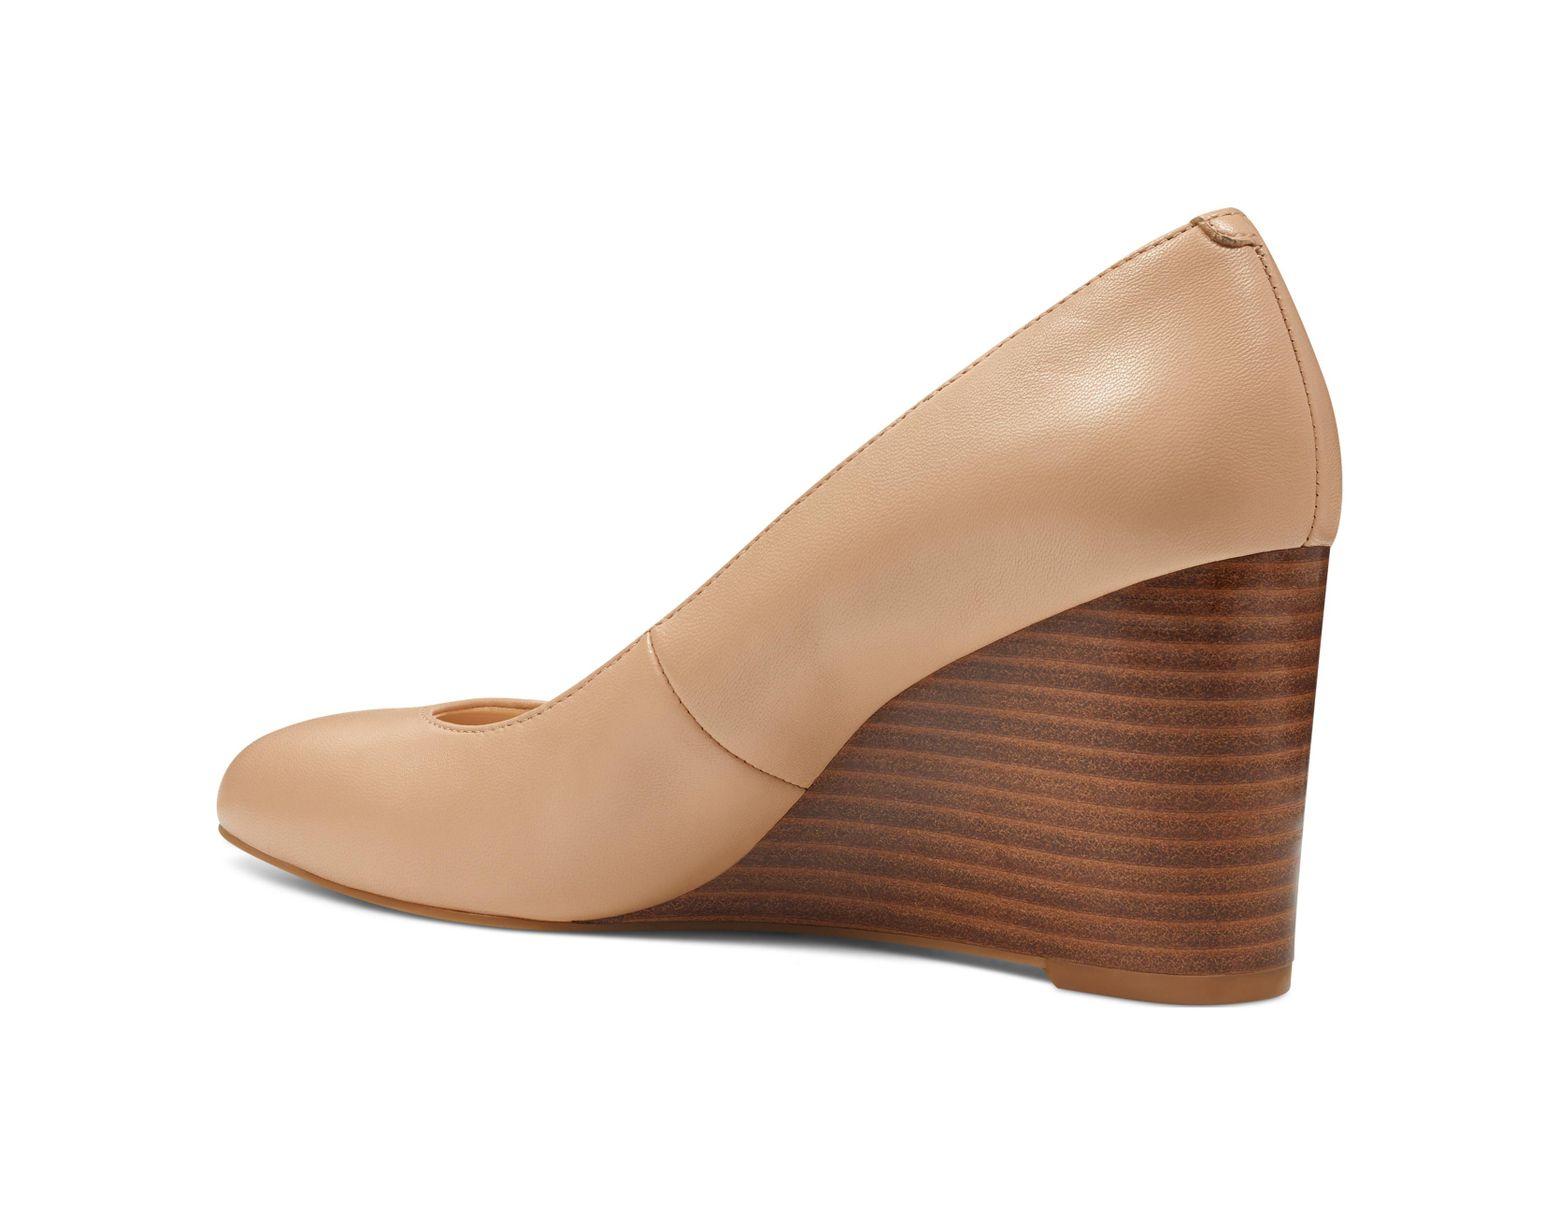 faa1d5bcb81 Women's Natural Jazzin Almond Toe Wedges